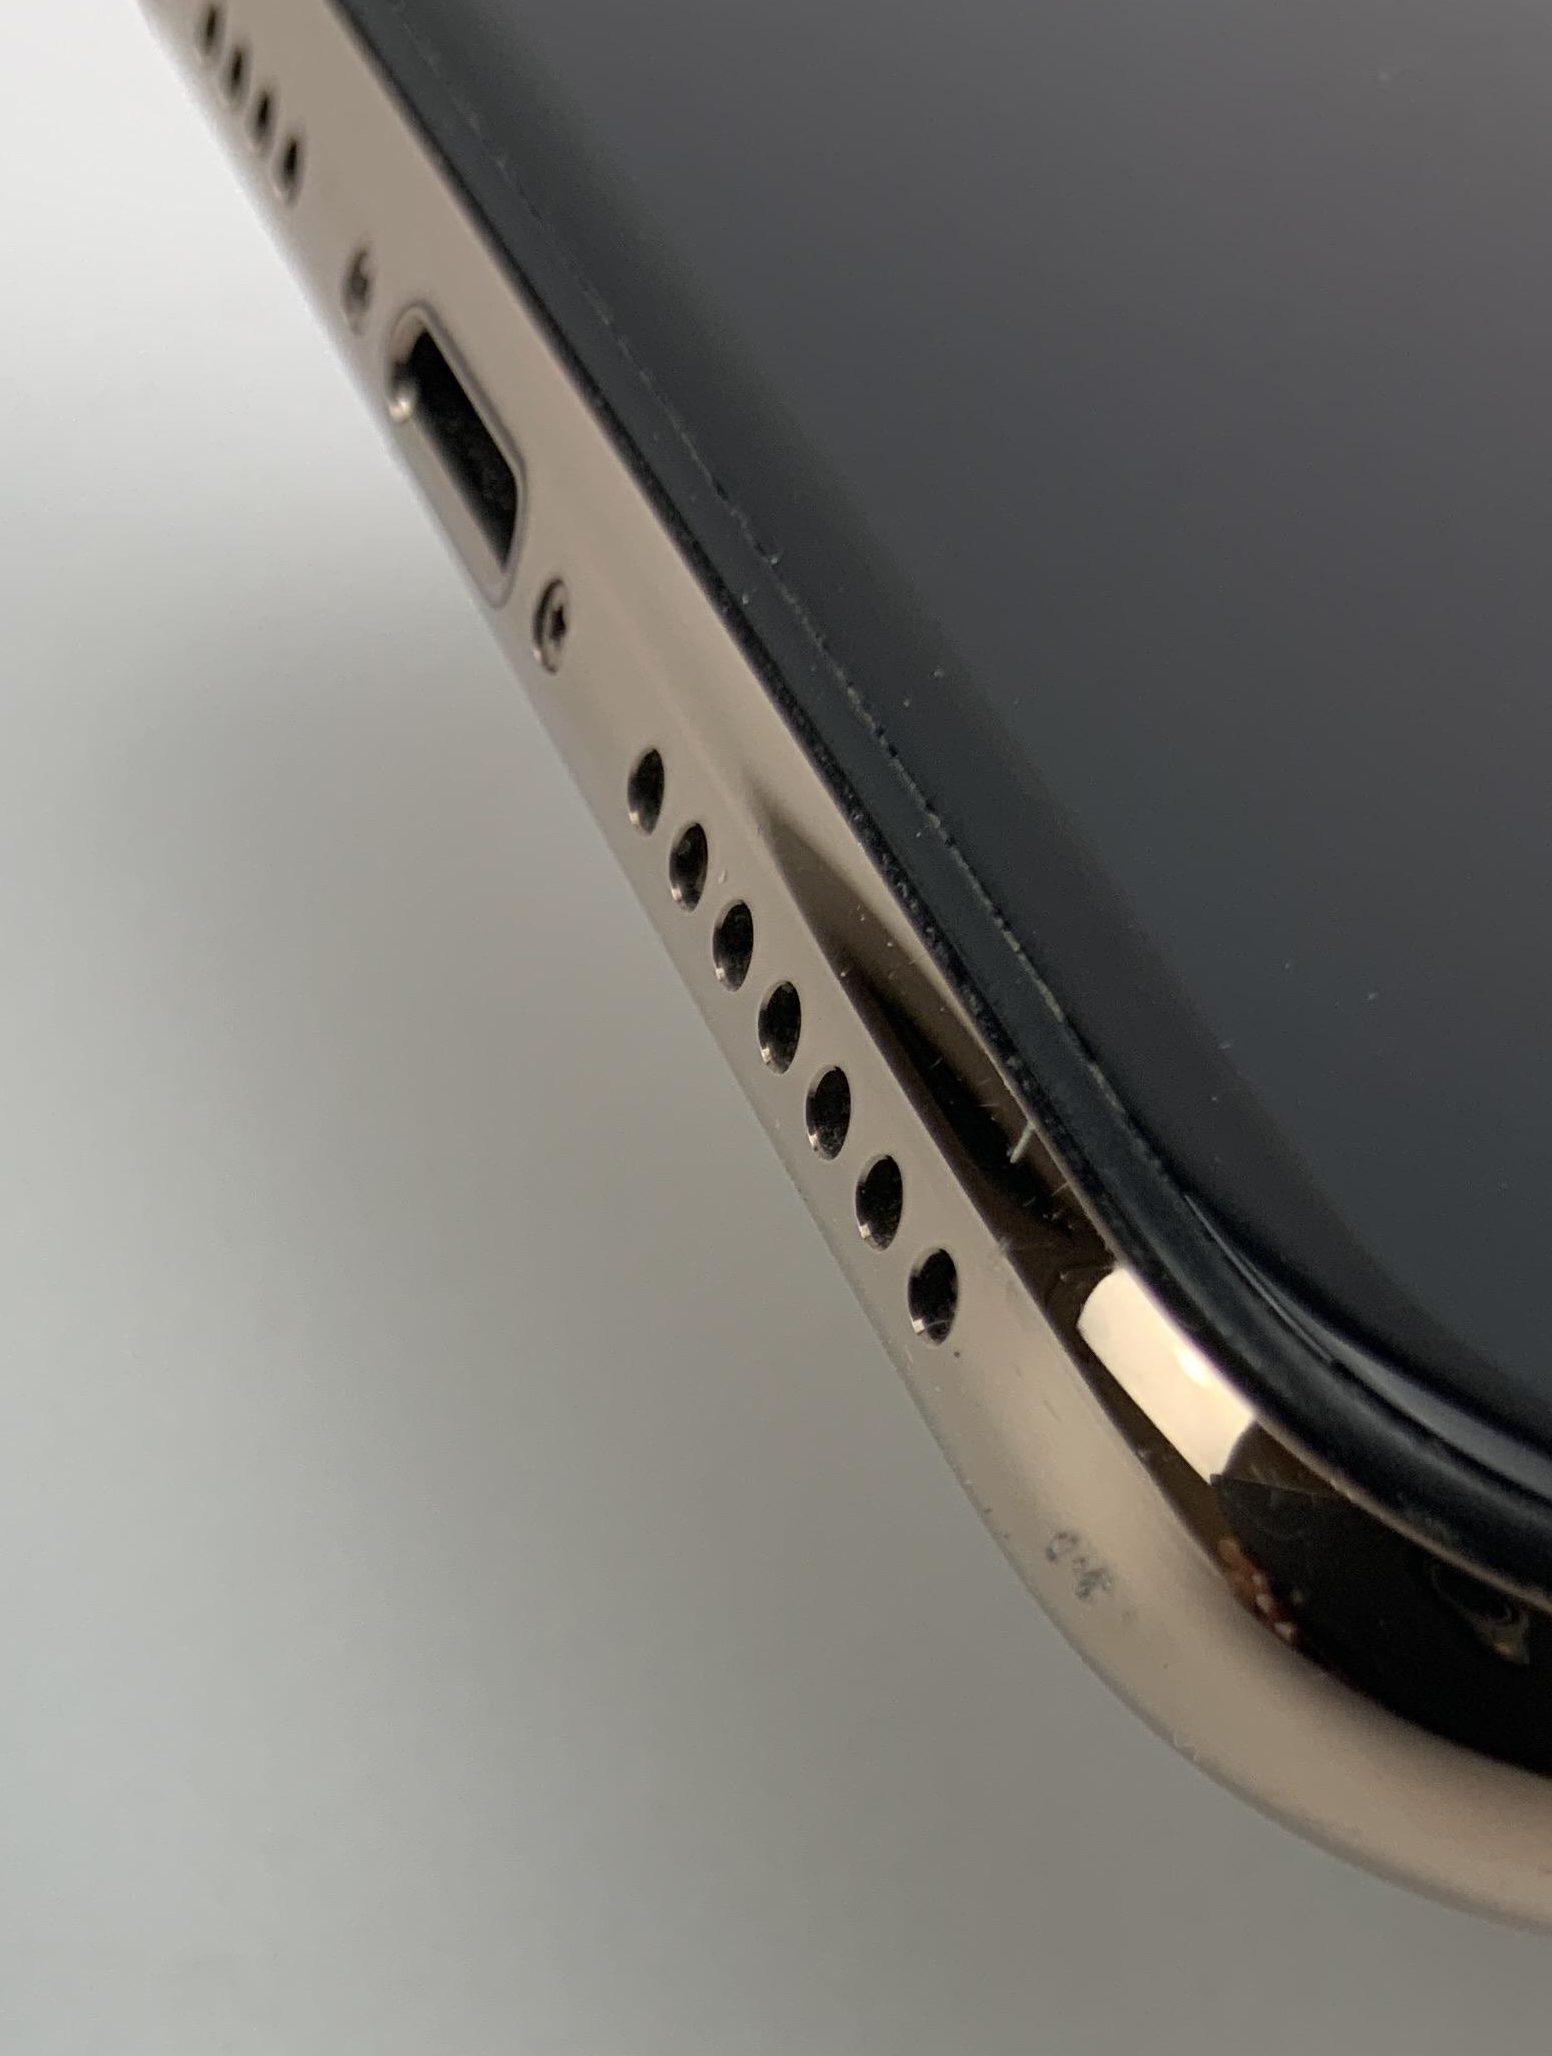 iPhone XS Max 64GB, 64GB, Gold, Afbeelding 3